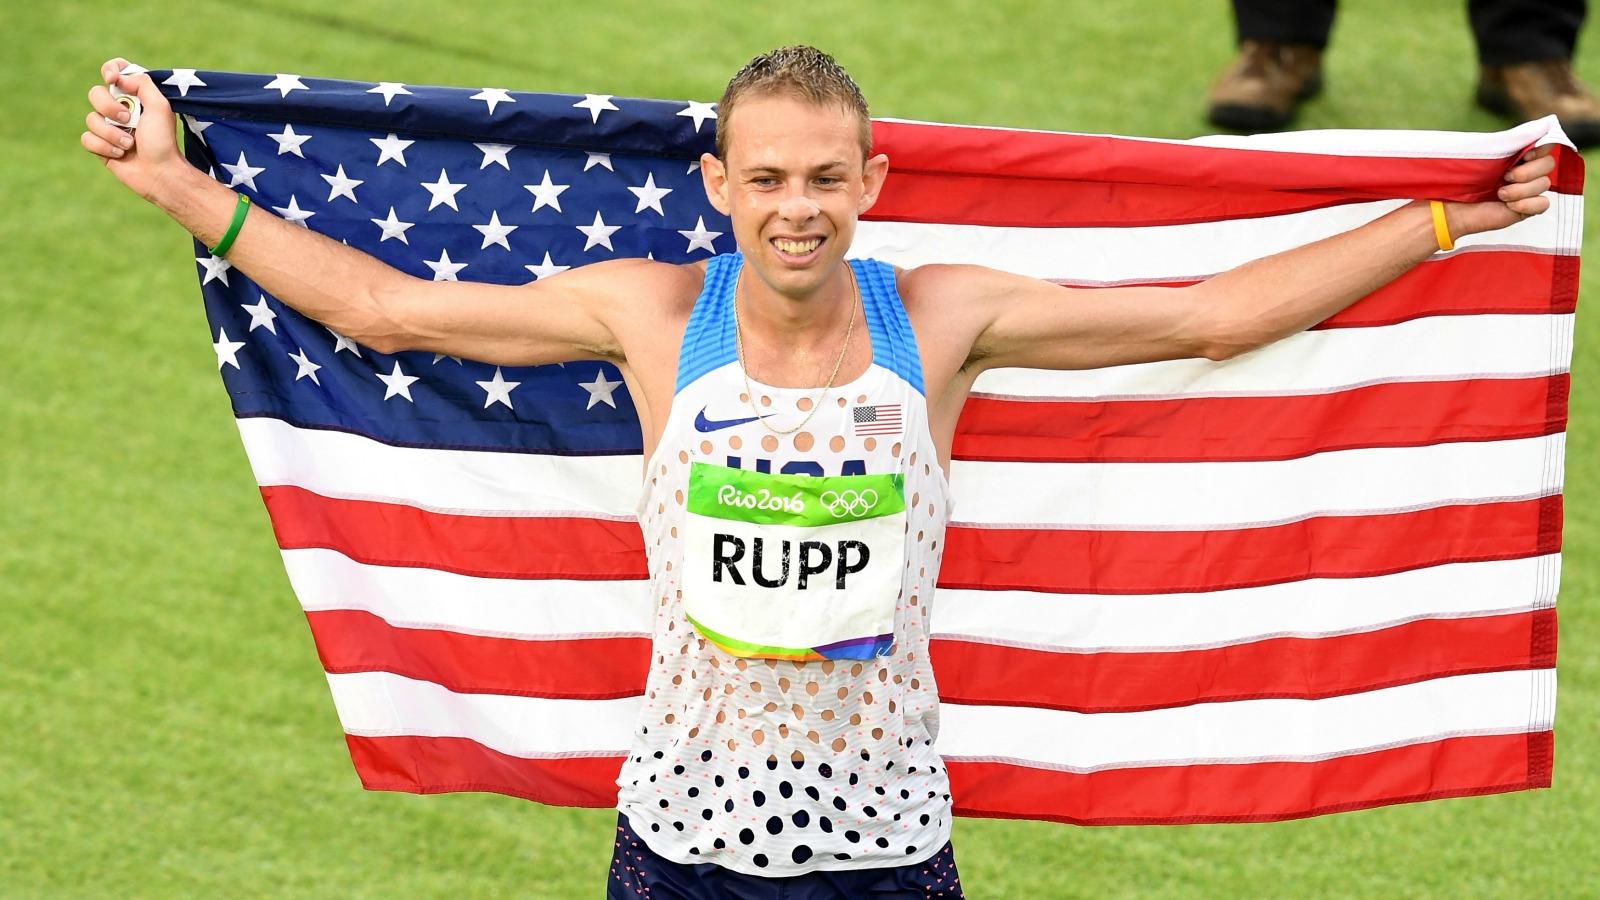 U.S. runner Galen Rupp took bronze in just his second marathon